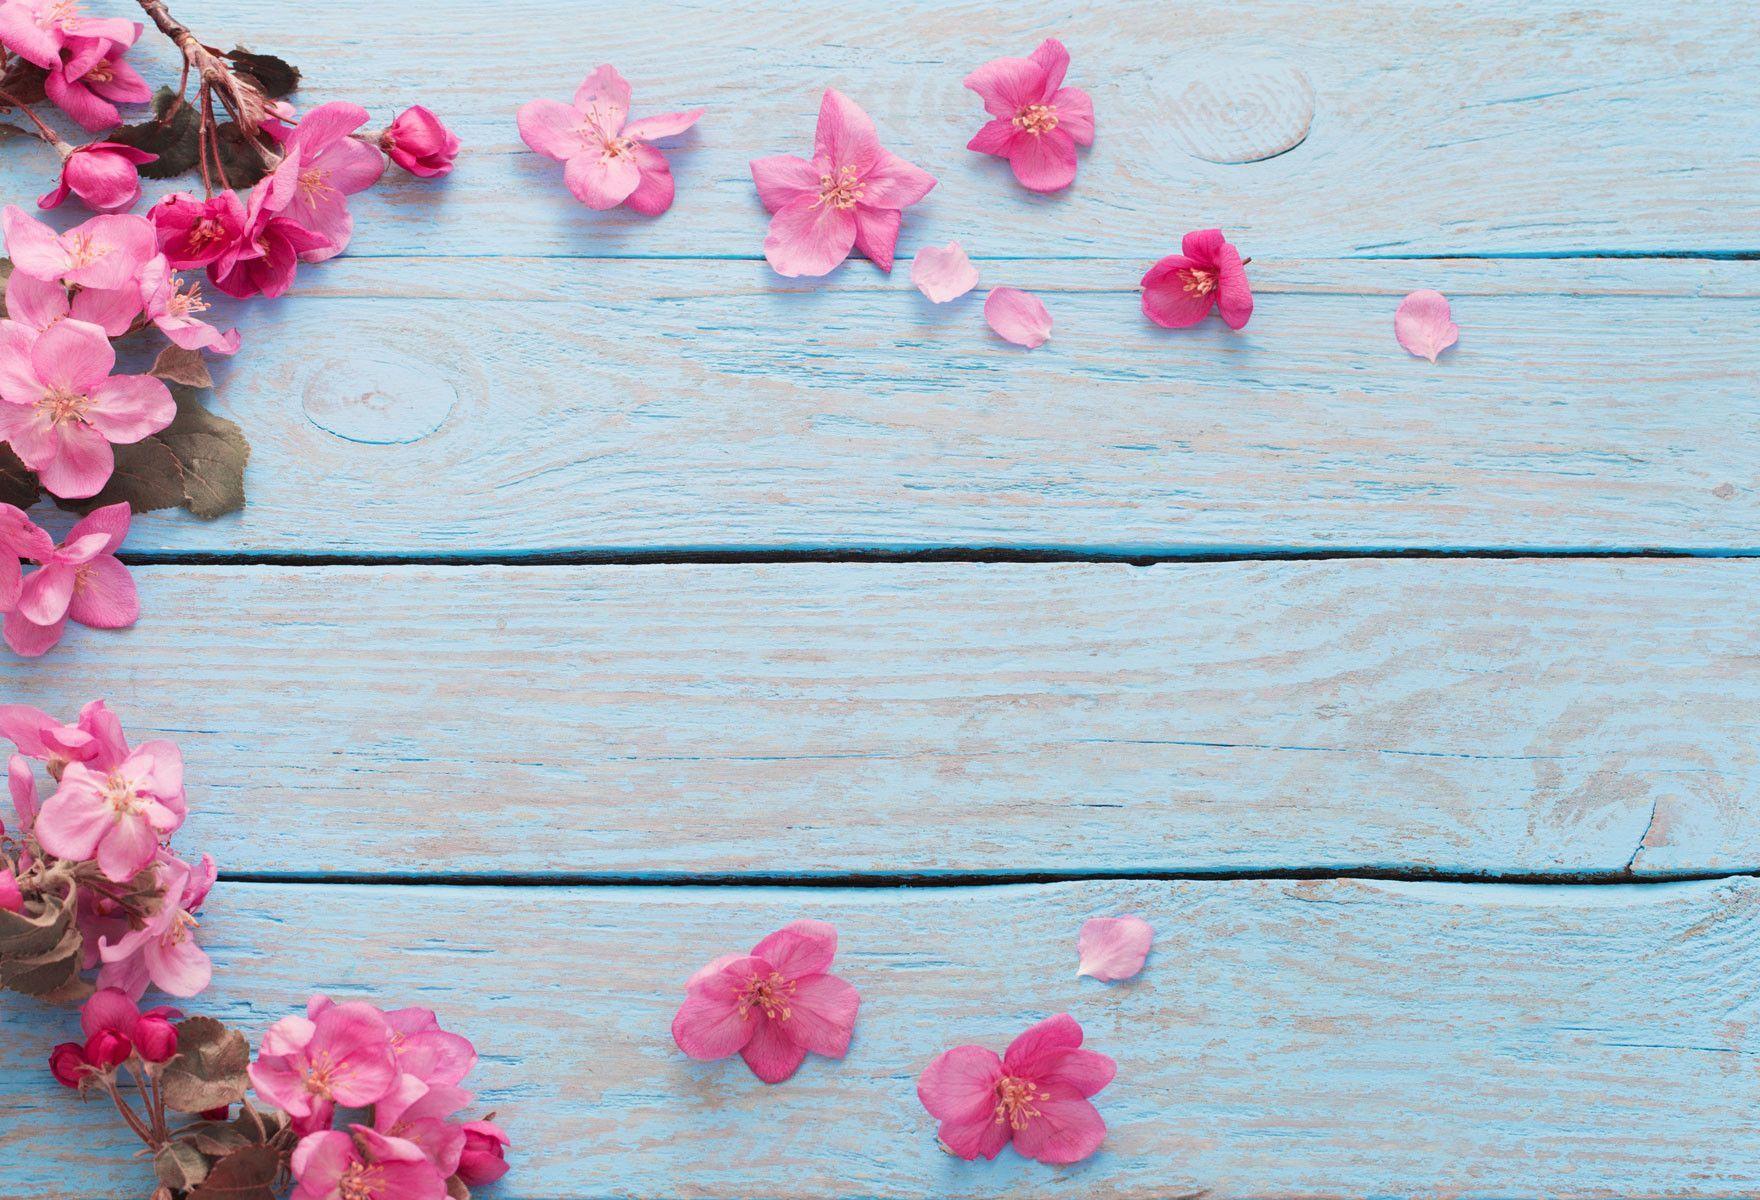 Fondos De Pantalla Madera Hd Vintage Para Fondo Celular En: Wood Backdrops Wooden Backdrop Flower Backgrounds Blue